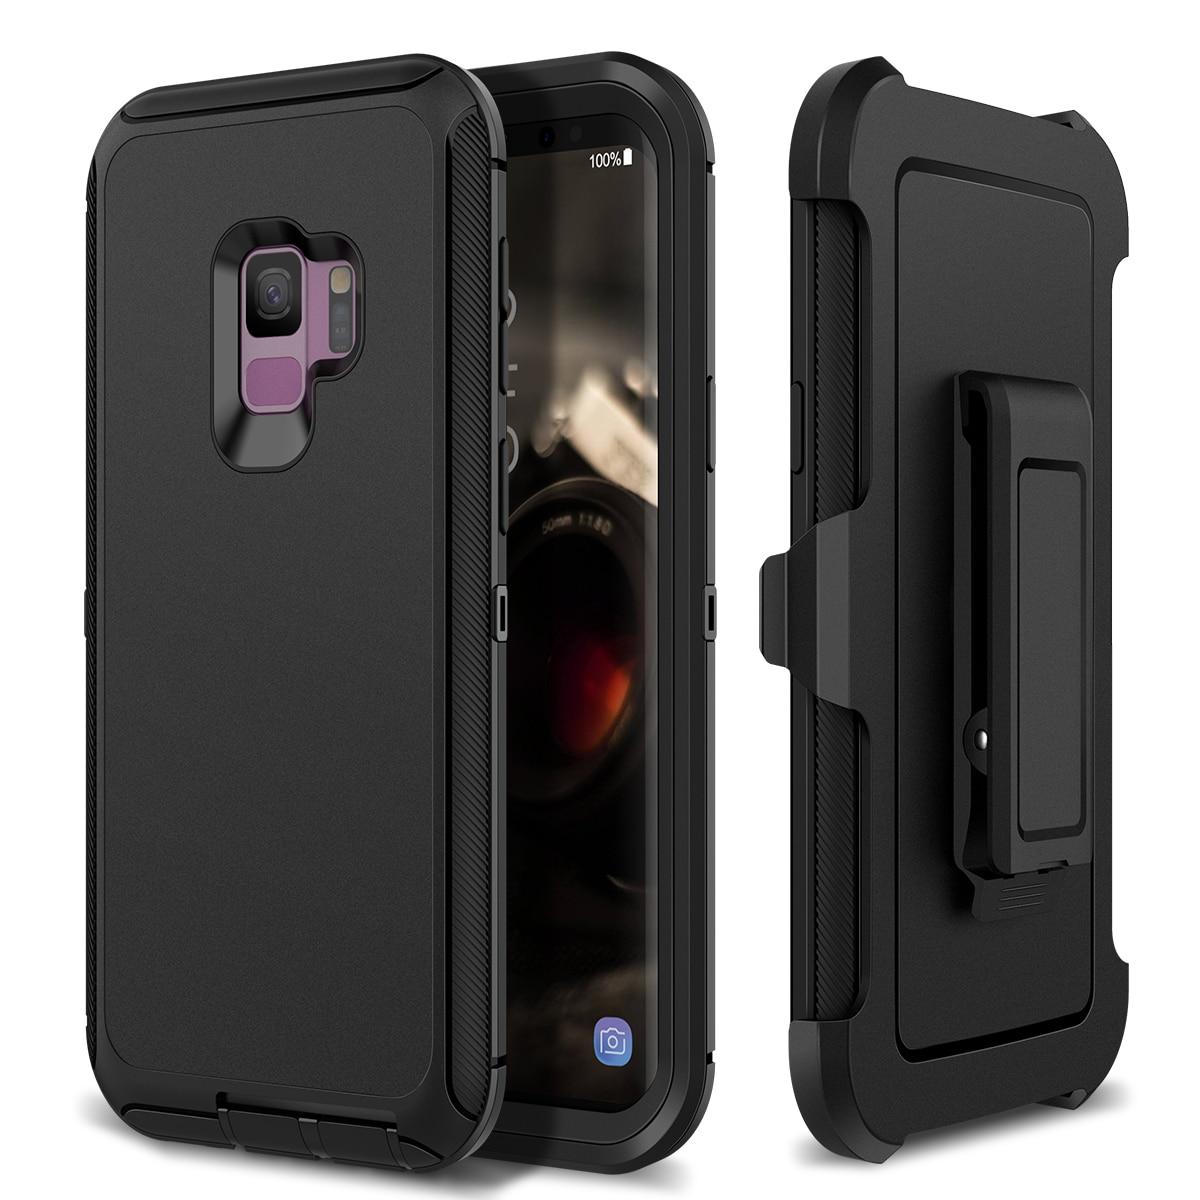 2c7e907330 3 en 1 duro caso para Samsung Galaxy S8 S9 plus deporte Clip de cinturón  protectora a prueba de golpes para Samsung nota 8 9